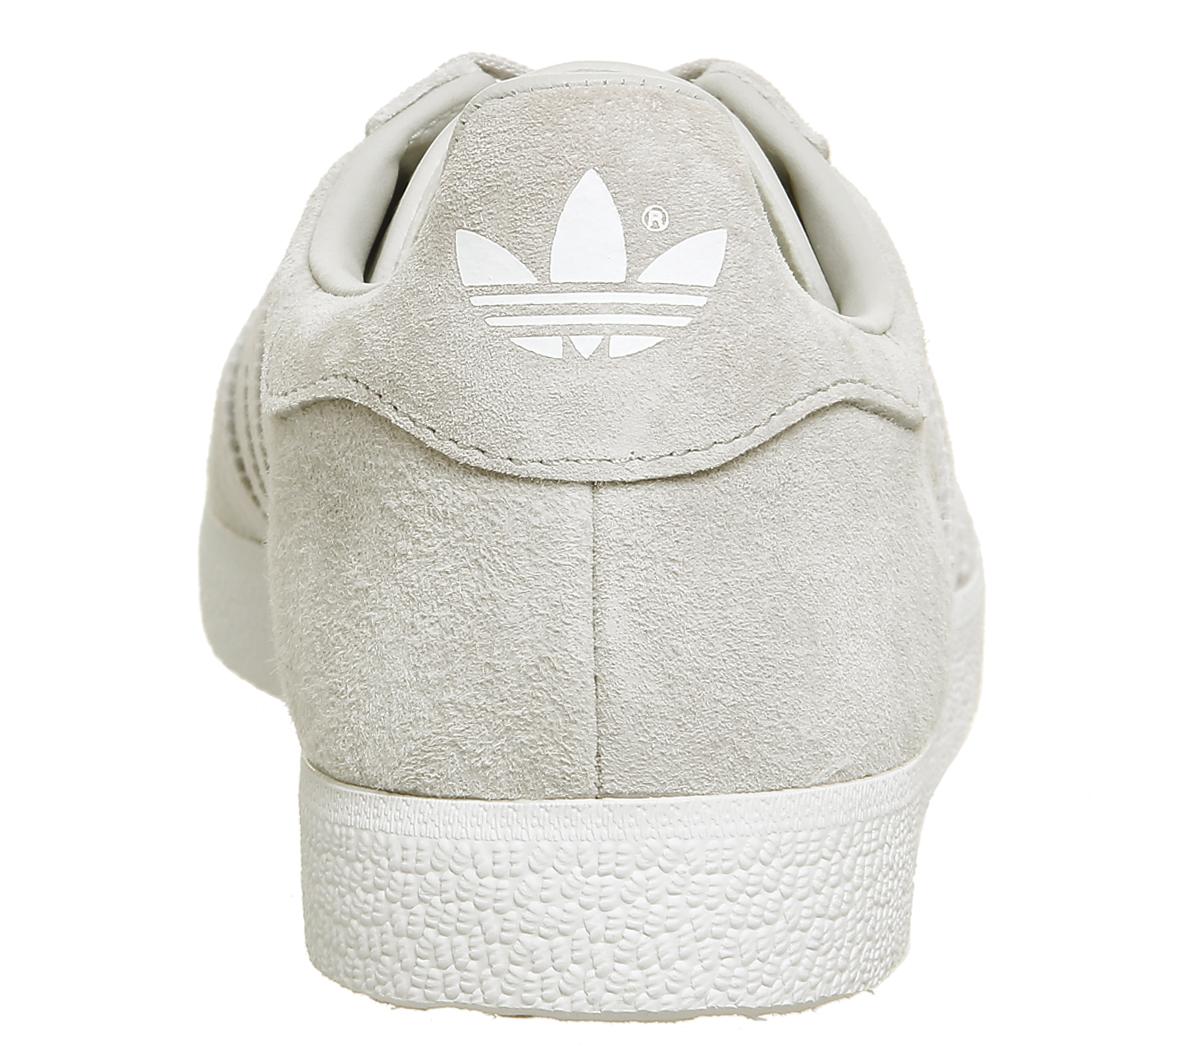 Sneakers basse -40% Adidas Raf Simons 30633IT -40% basse 7a3b40